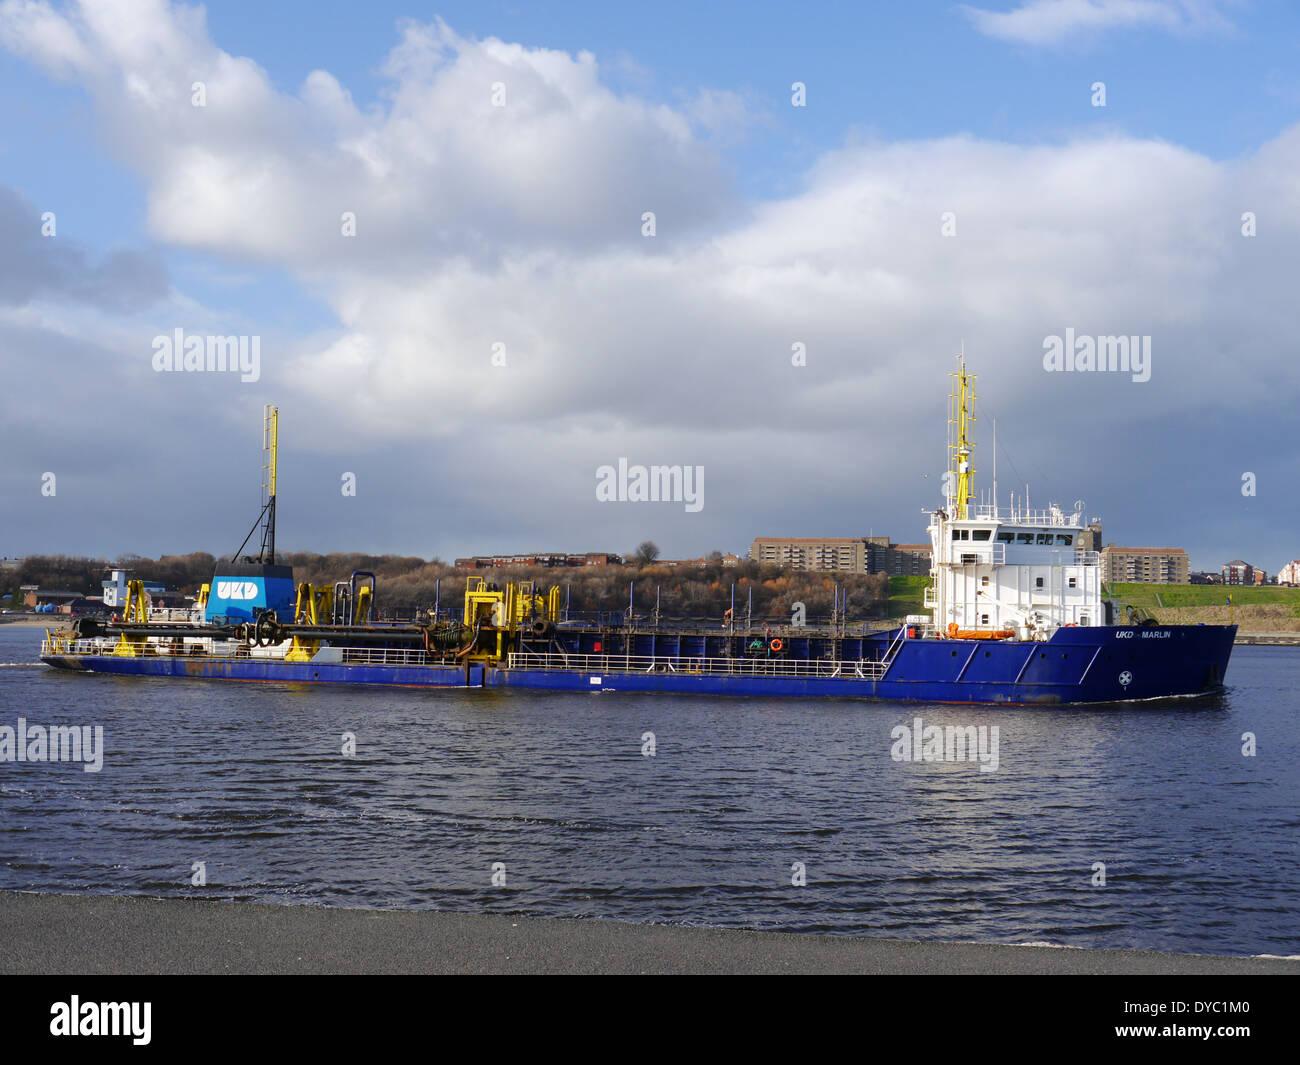 UKD Marlin, a trailing suction hopper dredger, leaving the River Tyne, South Shields, England, UK Stock Photo